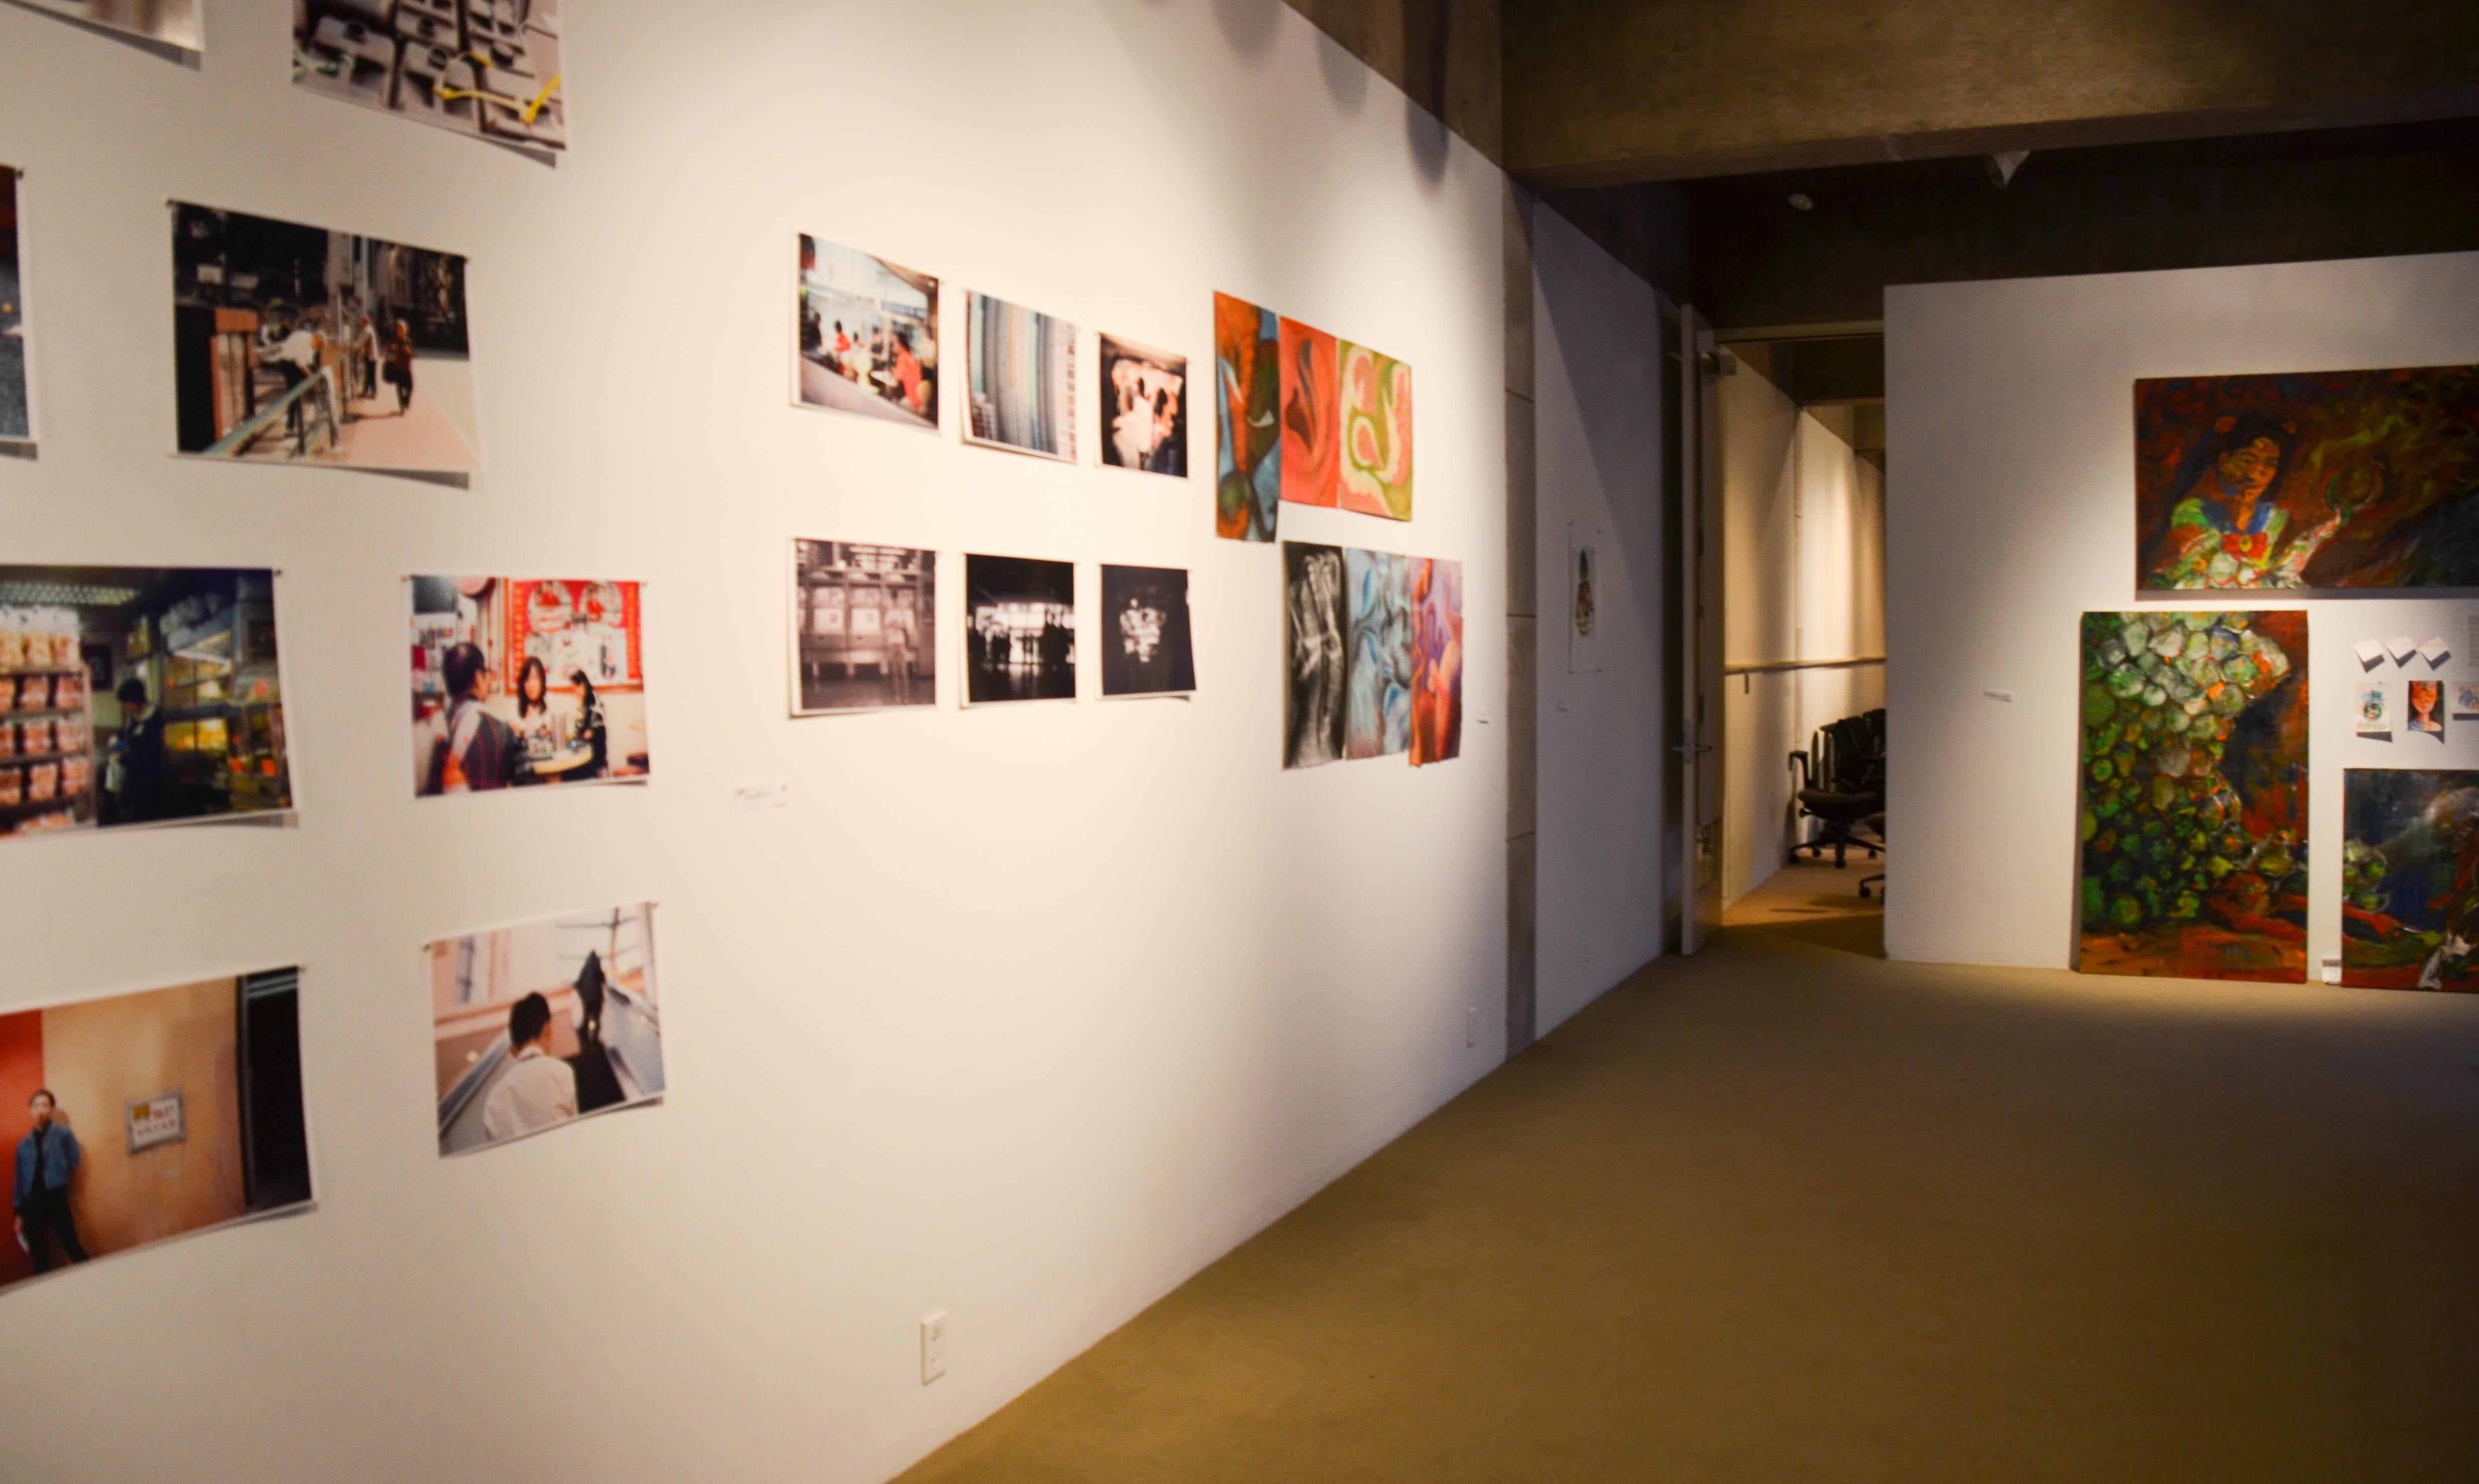 Dani Smotrich-Barr, Photo Editor